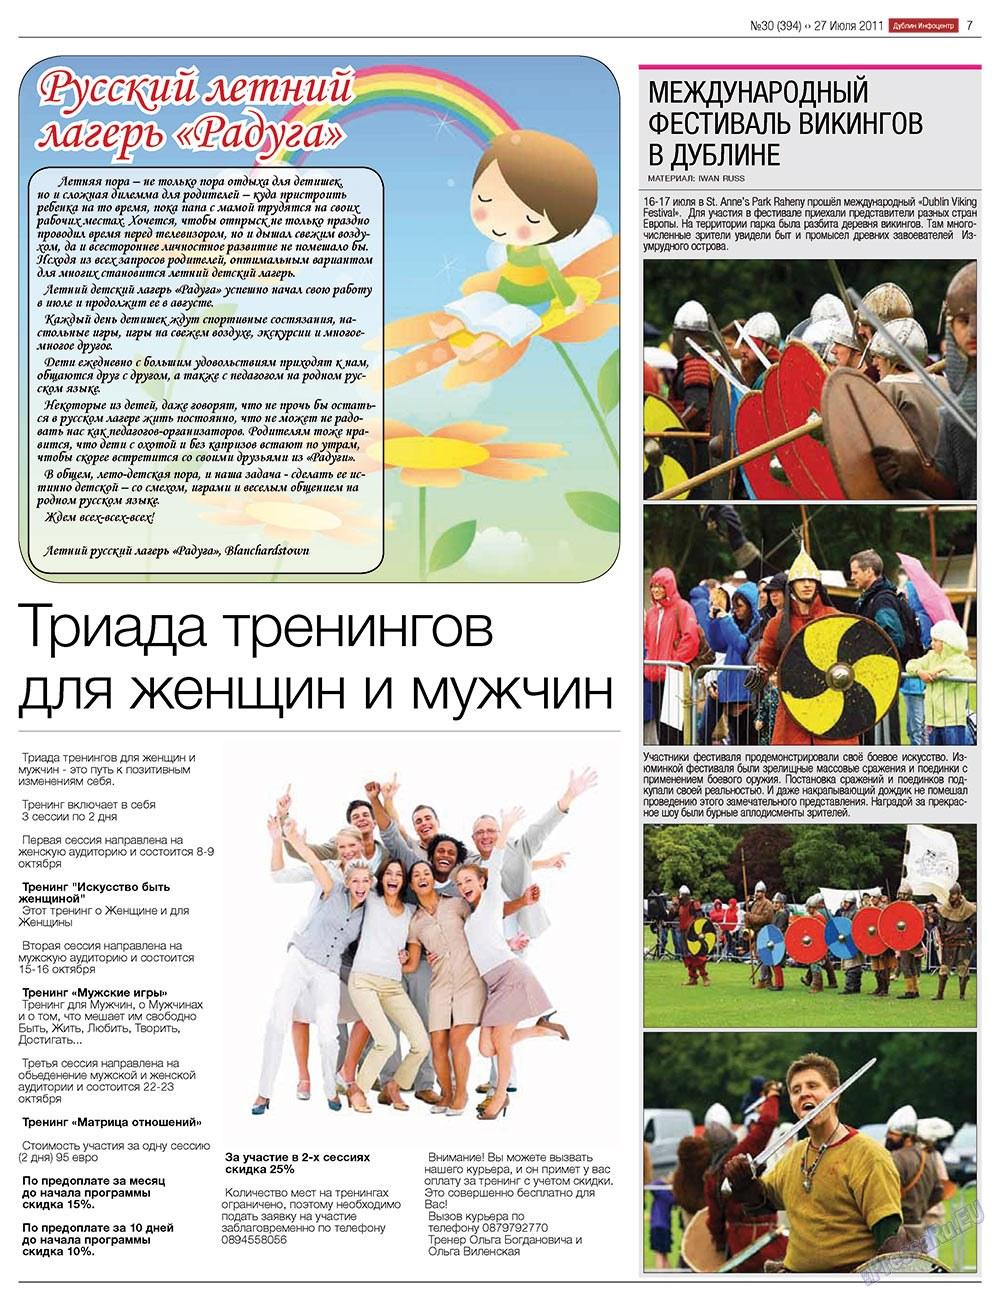 Дублин инфоцентр (газета). 2011 год, номер 30, стр. 7